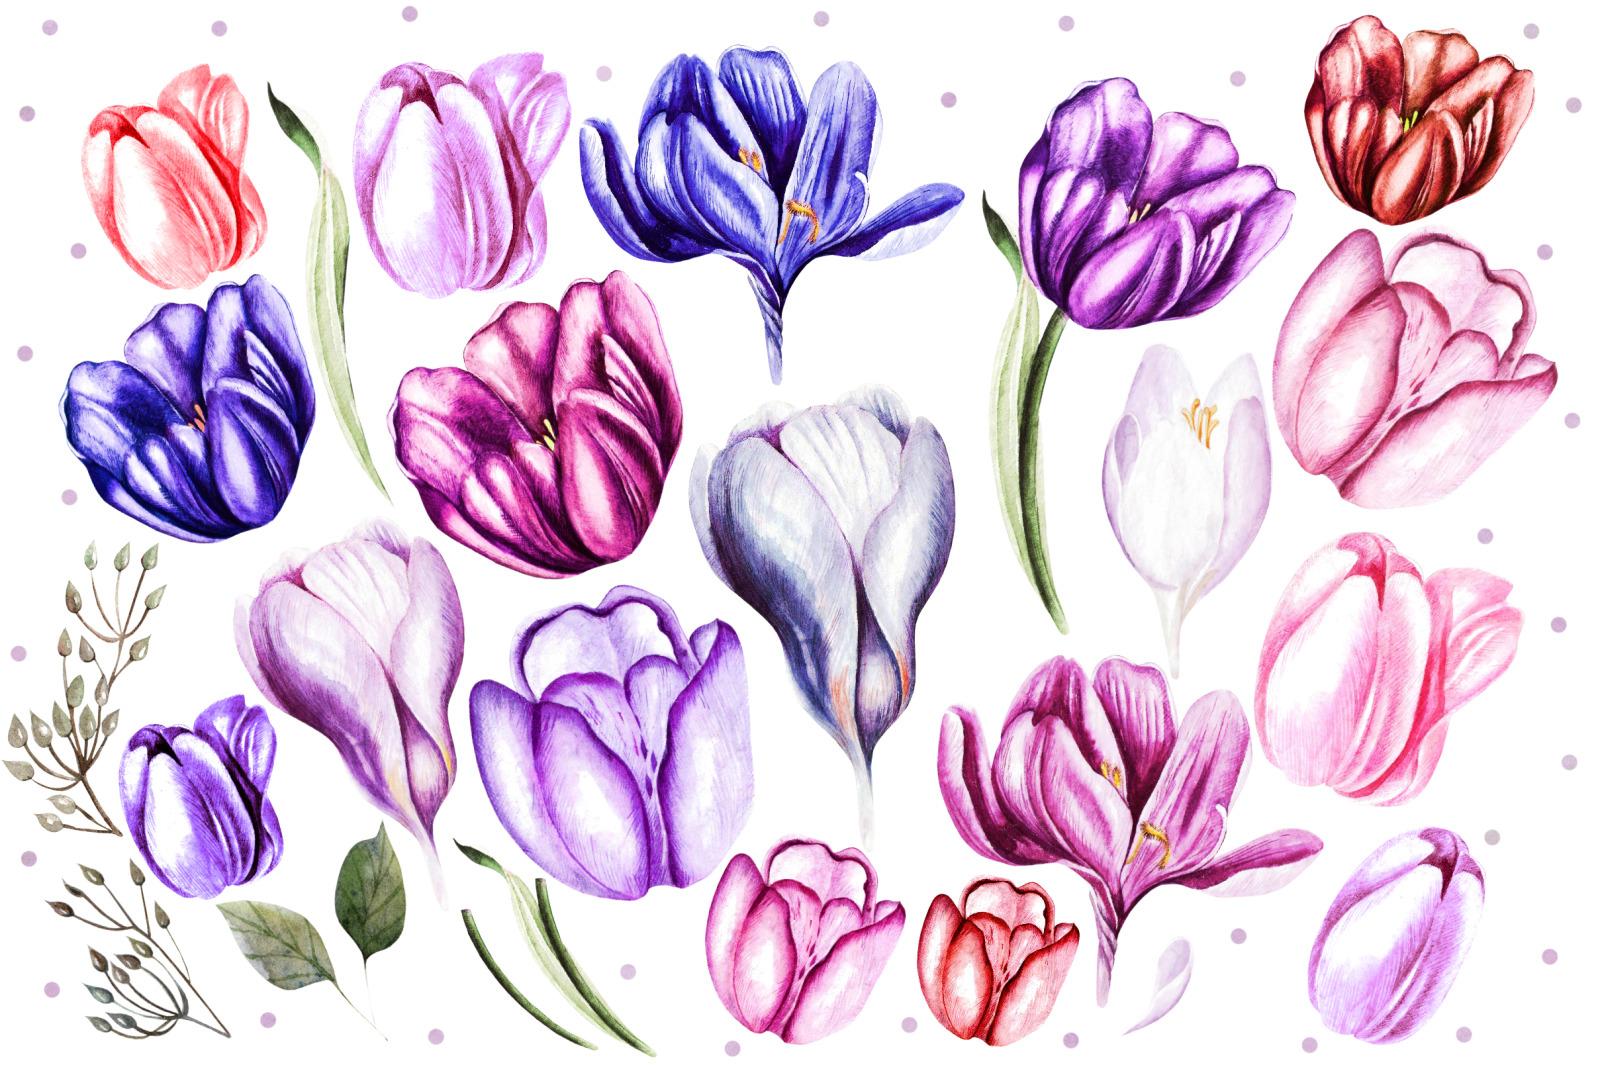 Watercolor Spring Tulips&Crocus